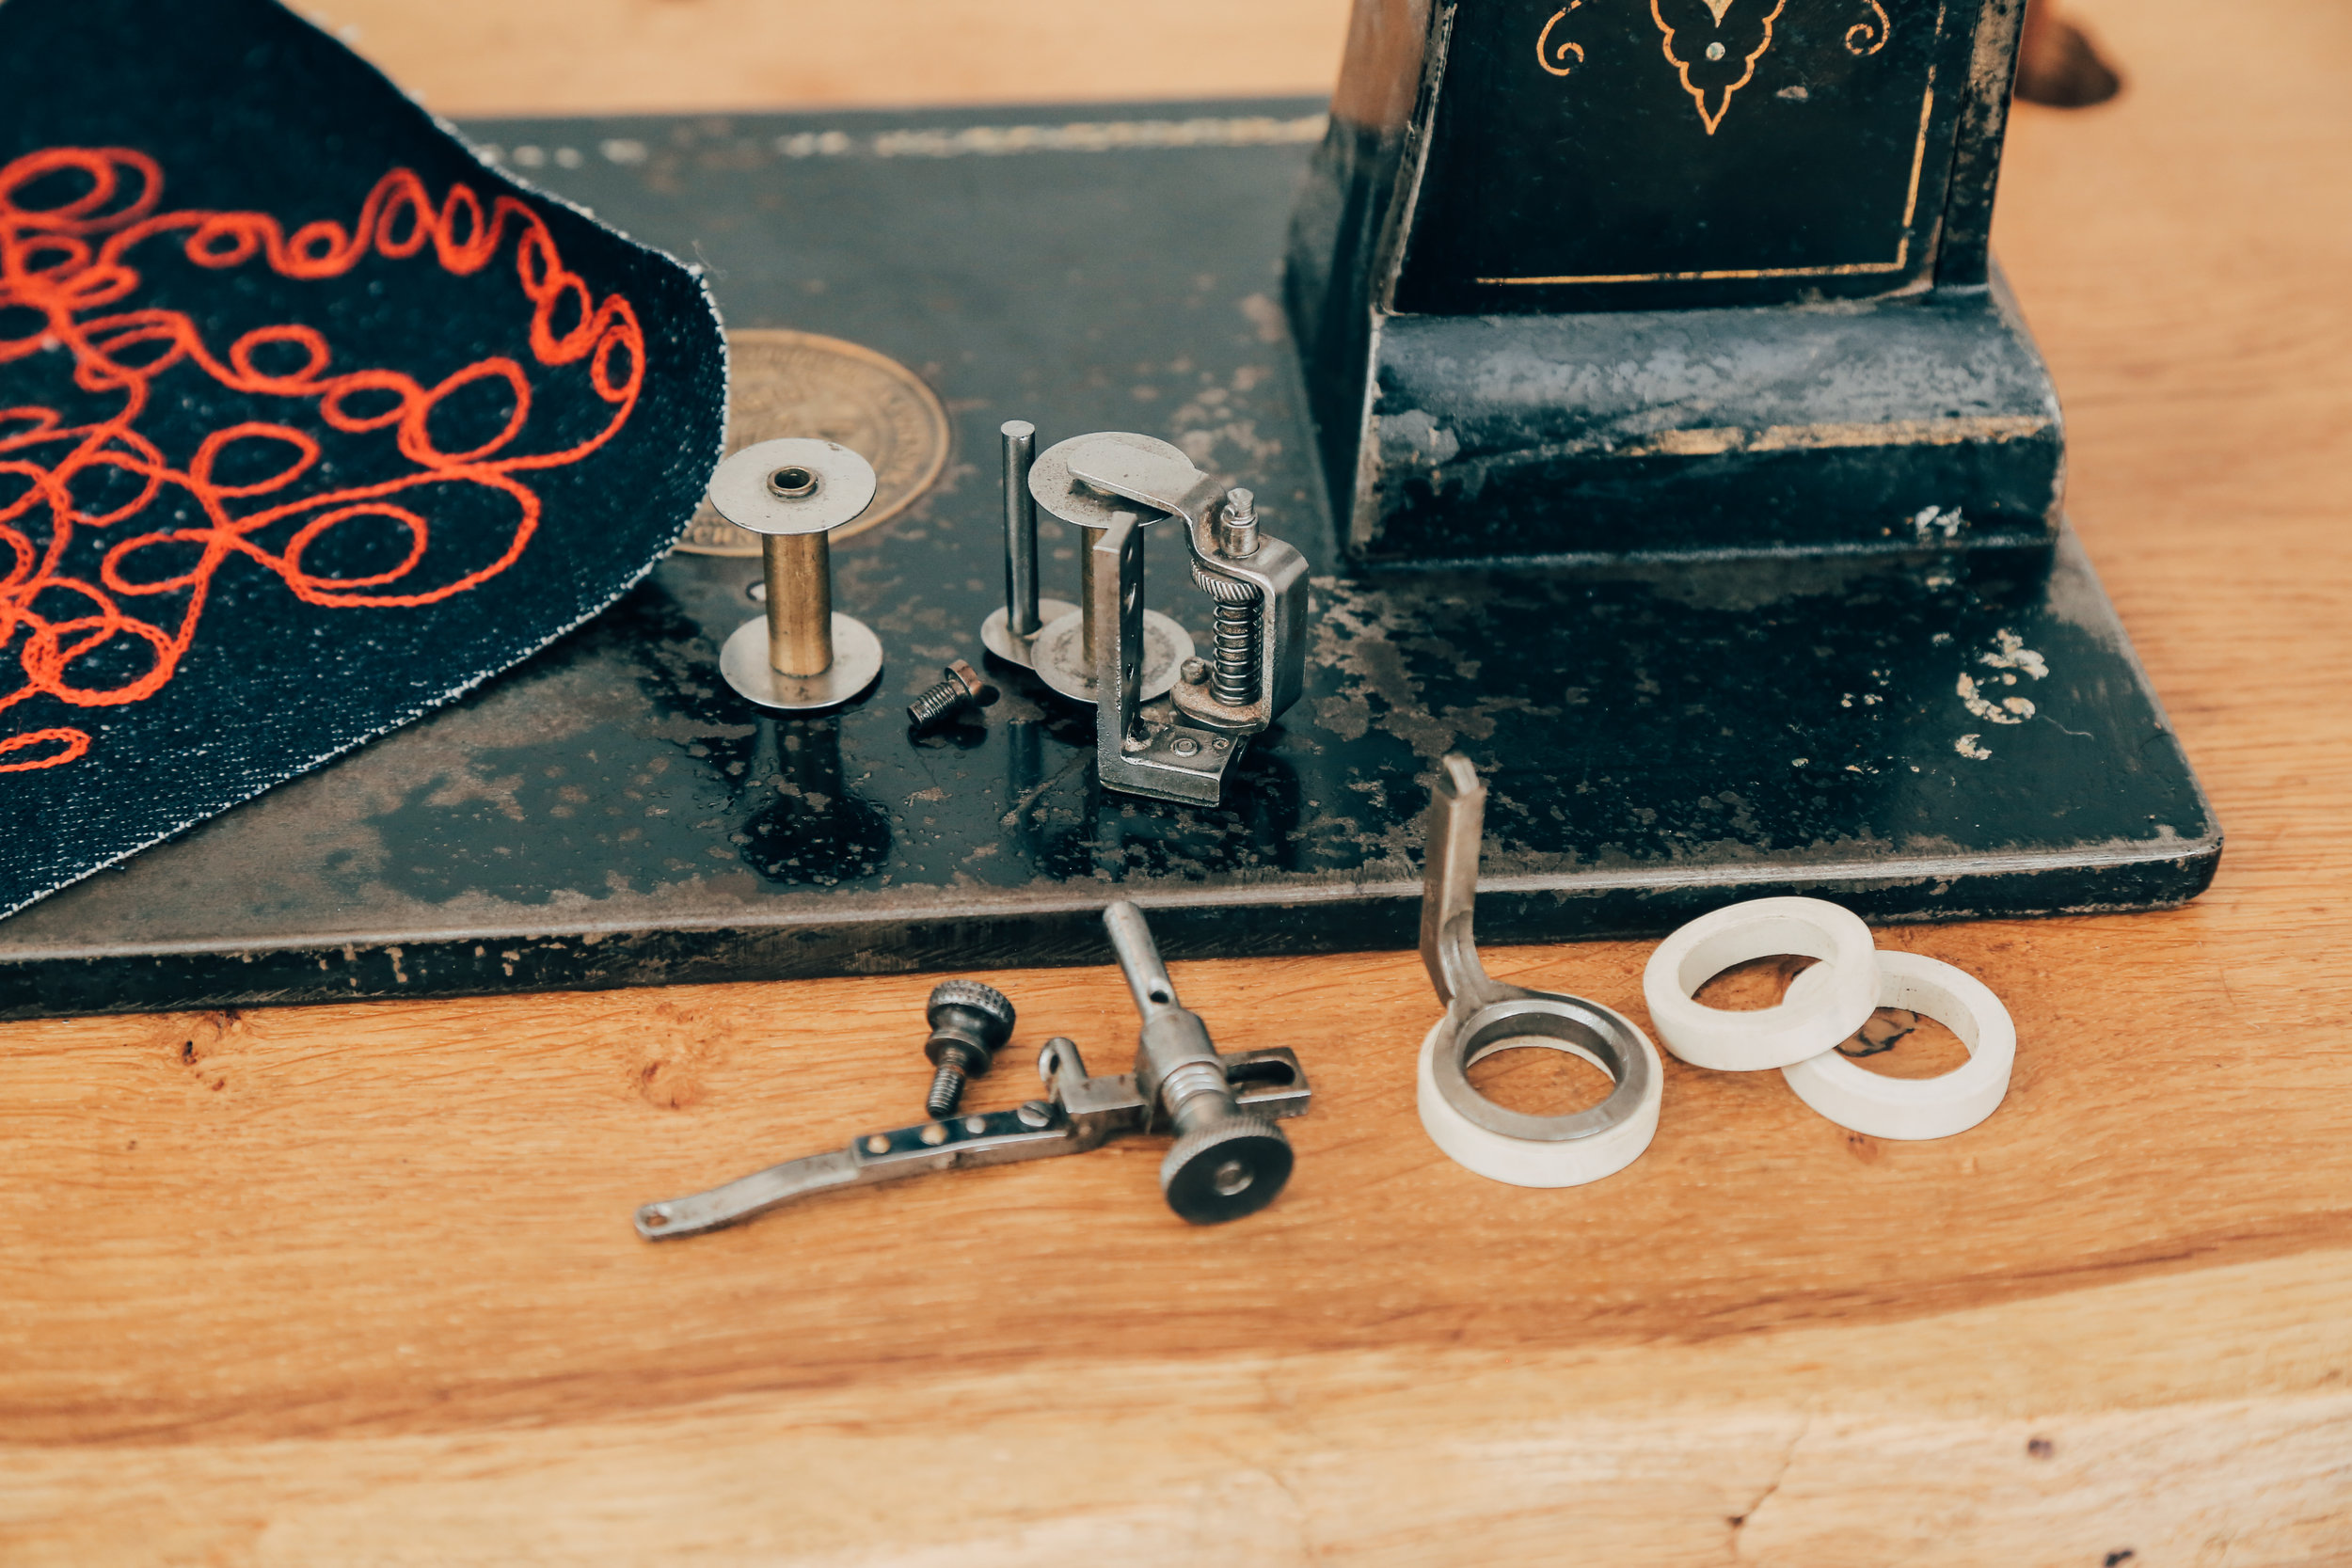 Lintz & Eckhardt 11 Cornely K vintage chainstitch embroidery machine 9